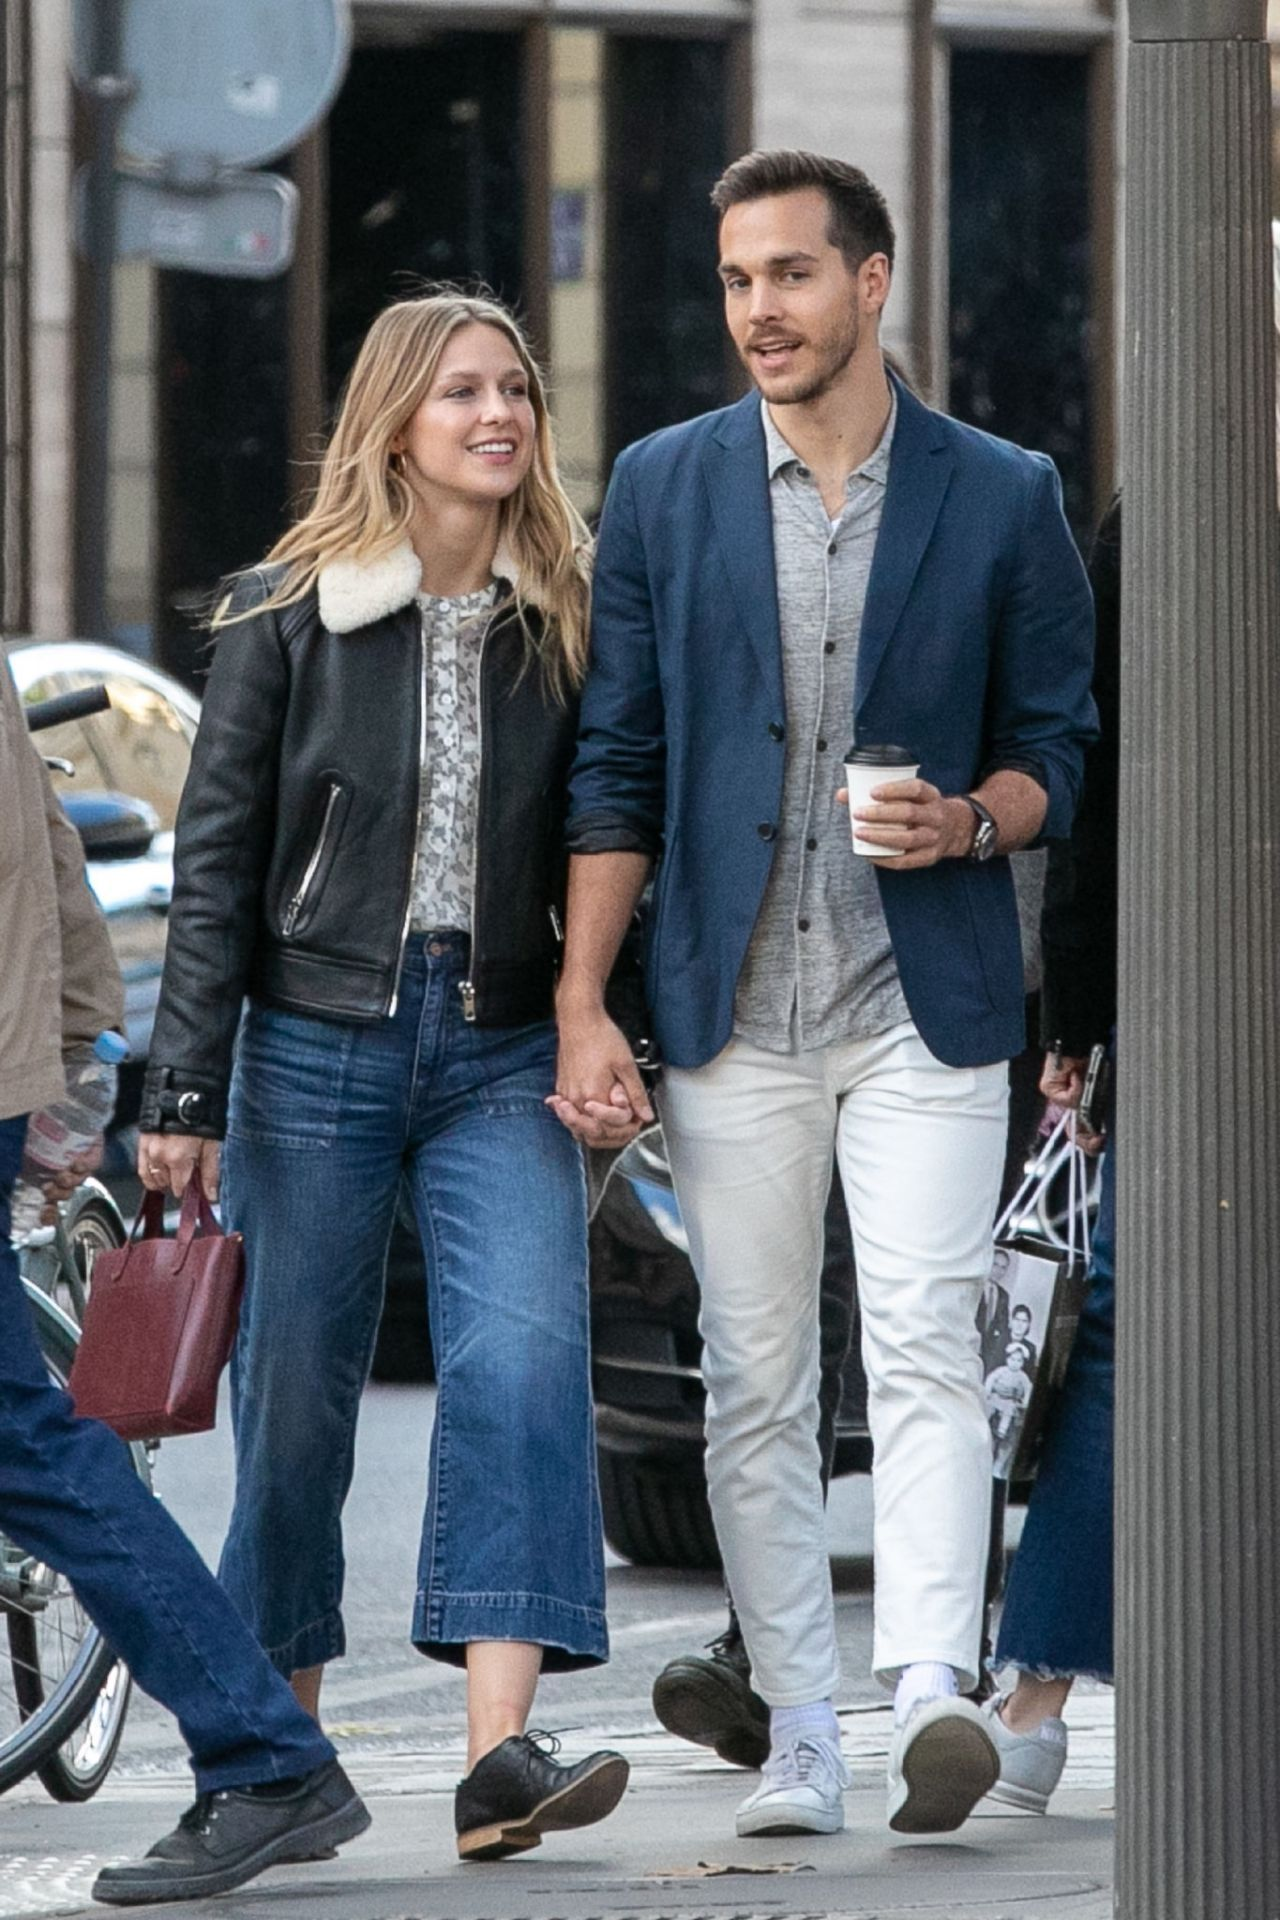 Melissa Benoist And Chris Wood Strolling On Rue Royale In Paris Https Ift Tt 2okqcgy Chris Wood Melissa Supergirl Melissa Benoist